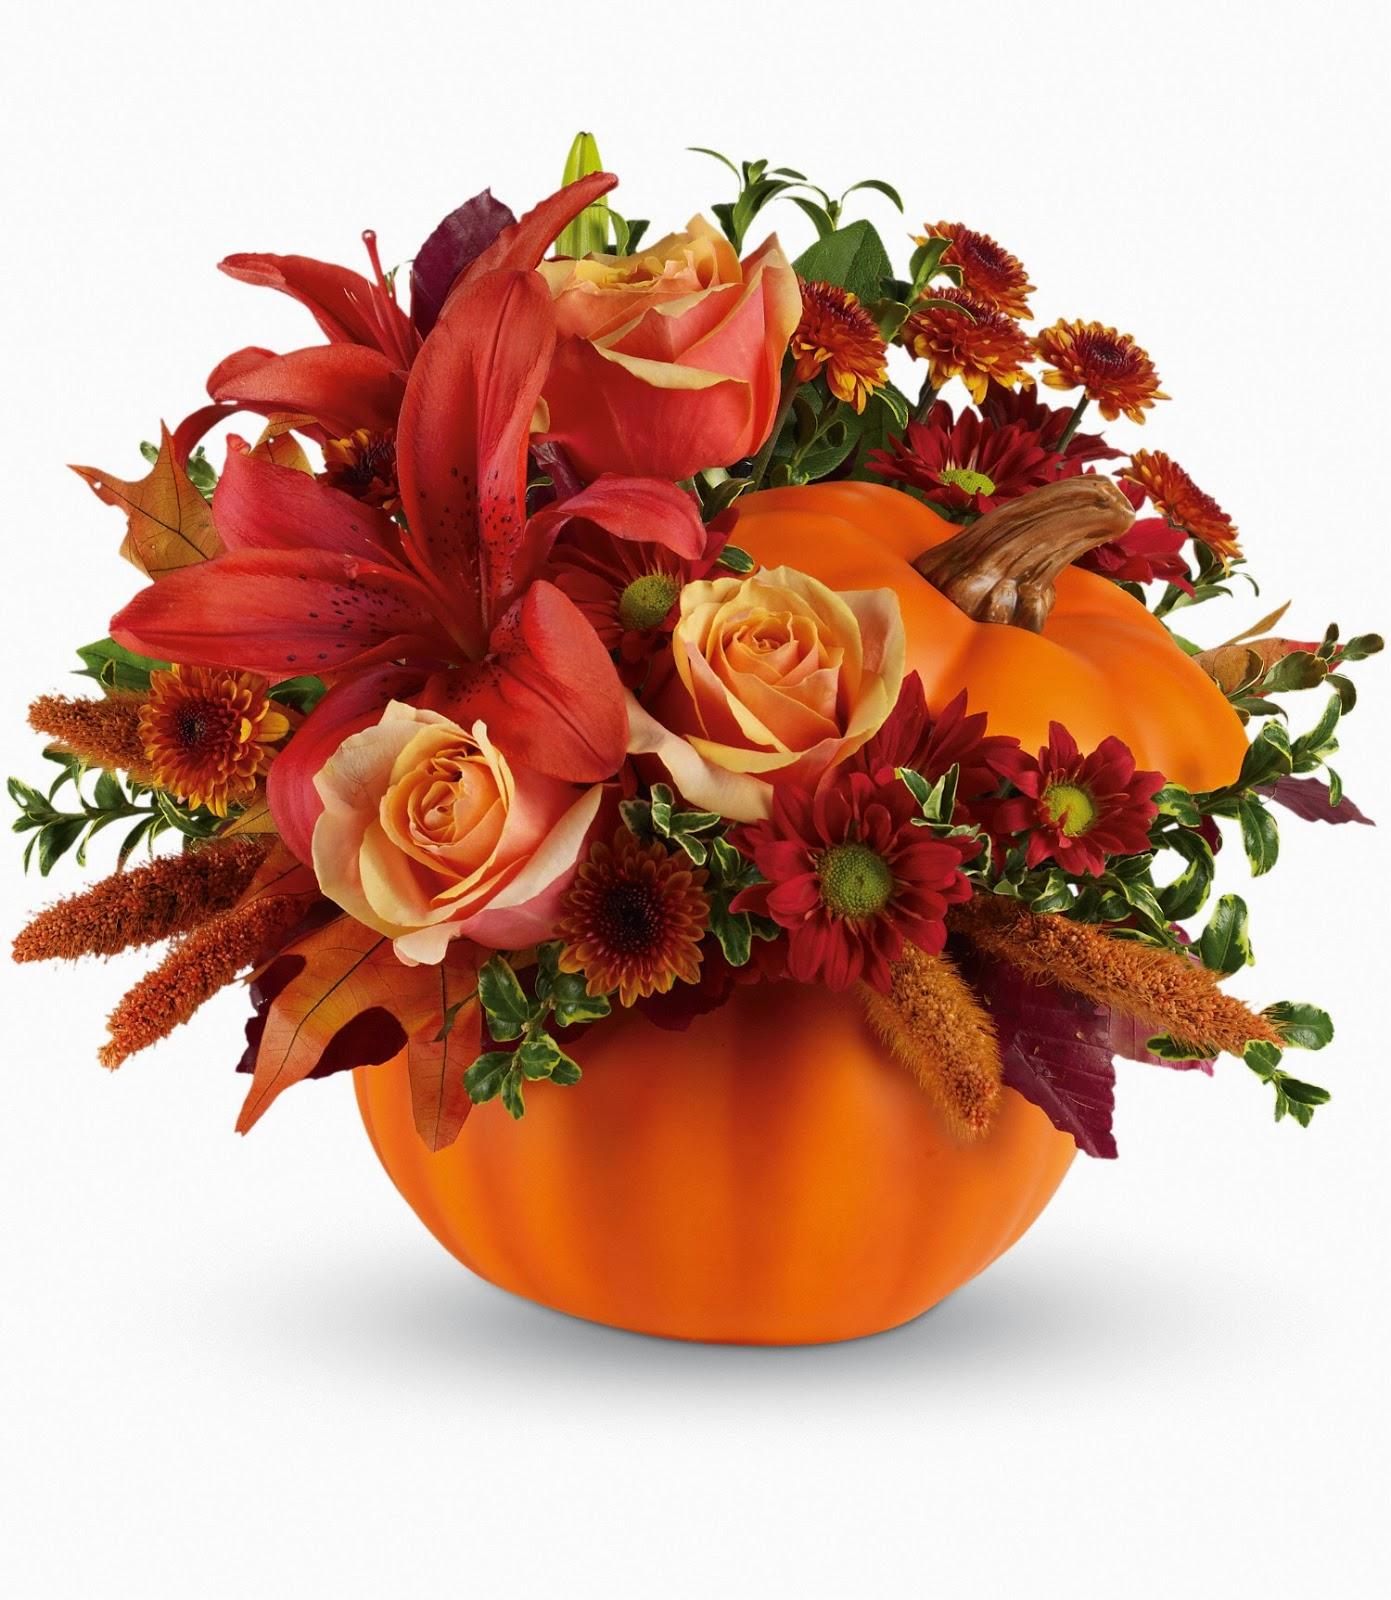 http://www.larose.com/brands/Autumn-Flowers.html